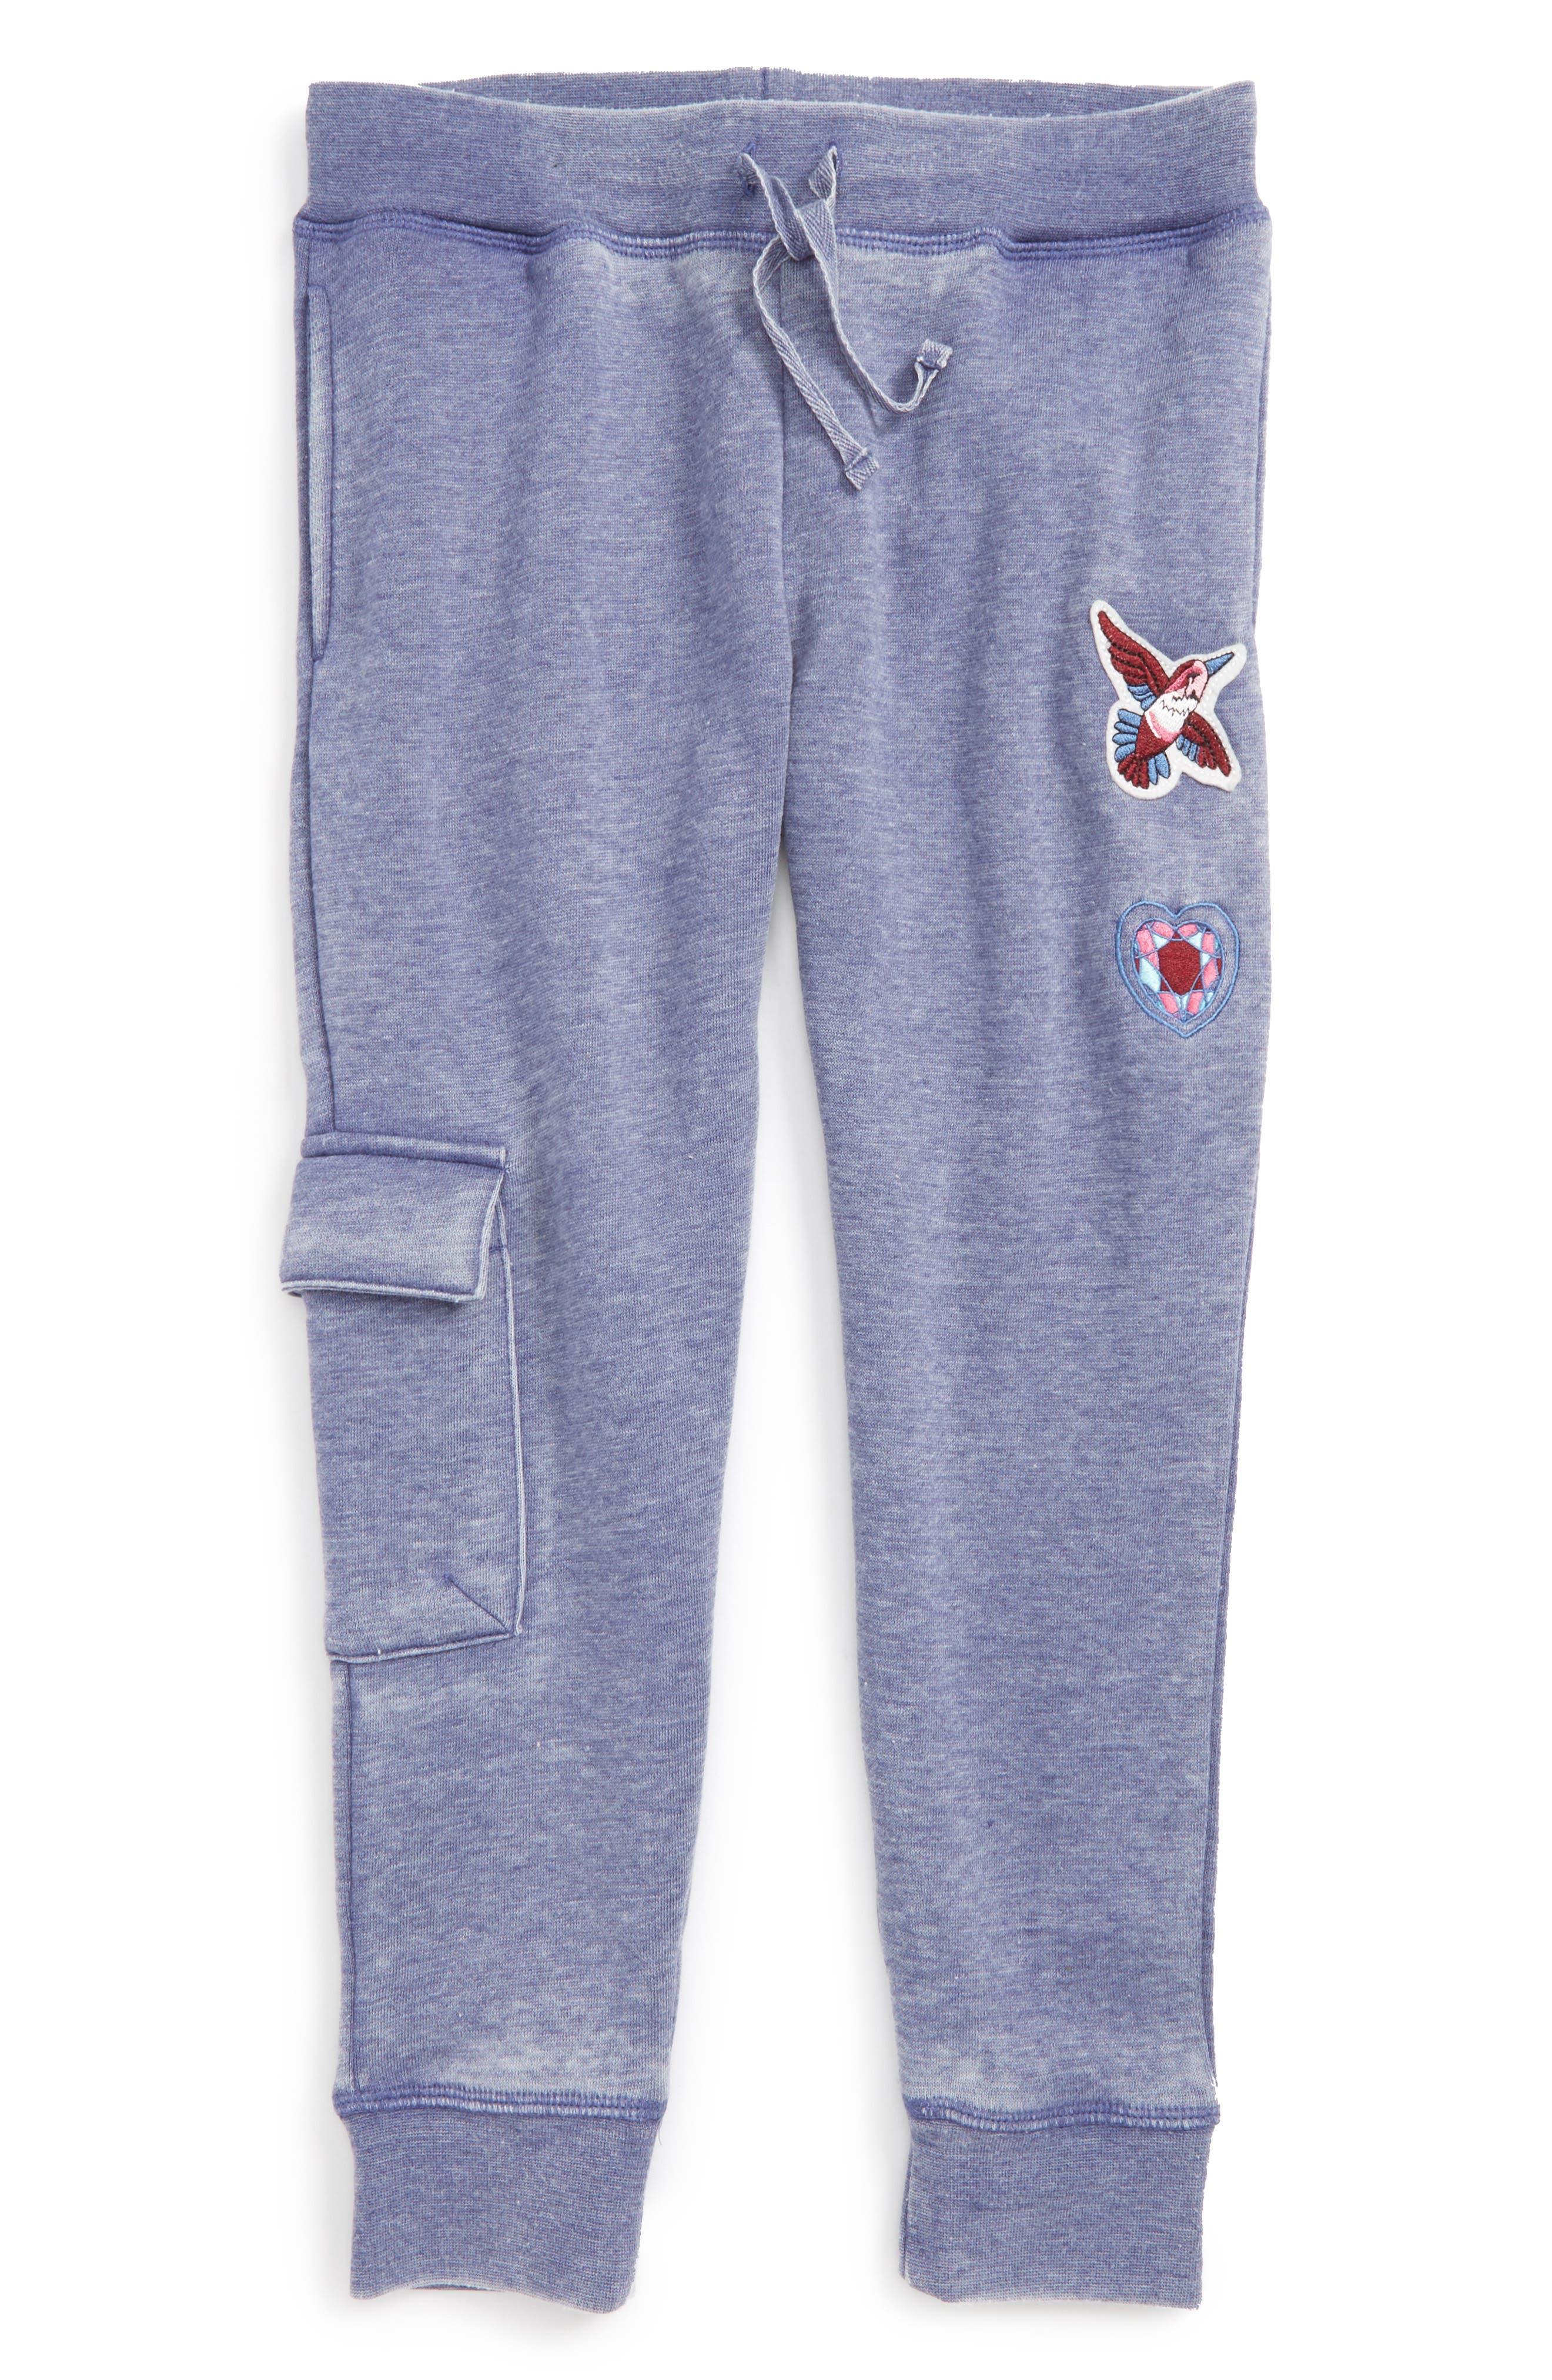 Alternate Image 1 Selected - C & C California Appliqué Jogger Pants (Big Girls)